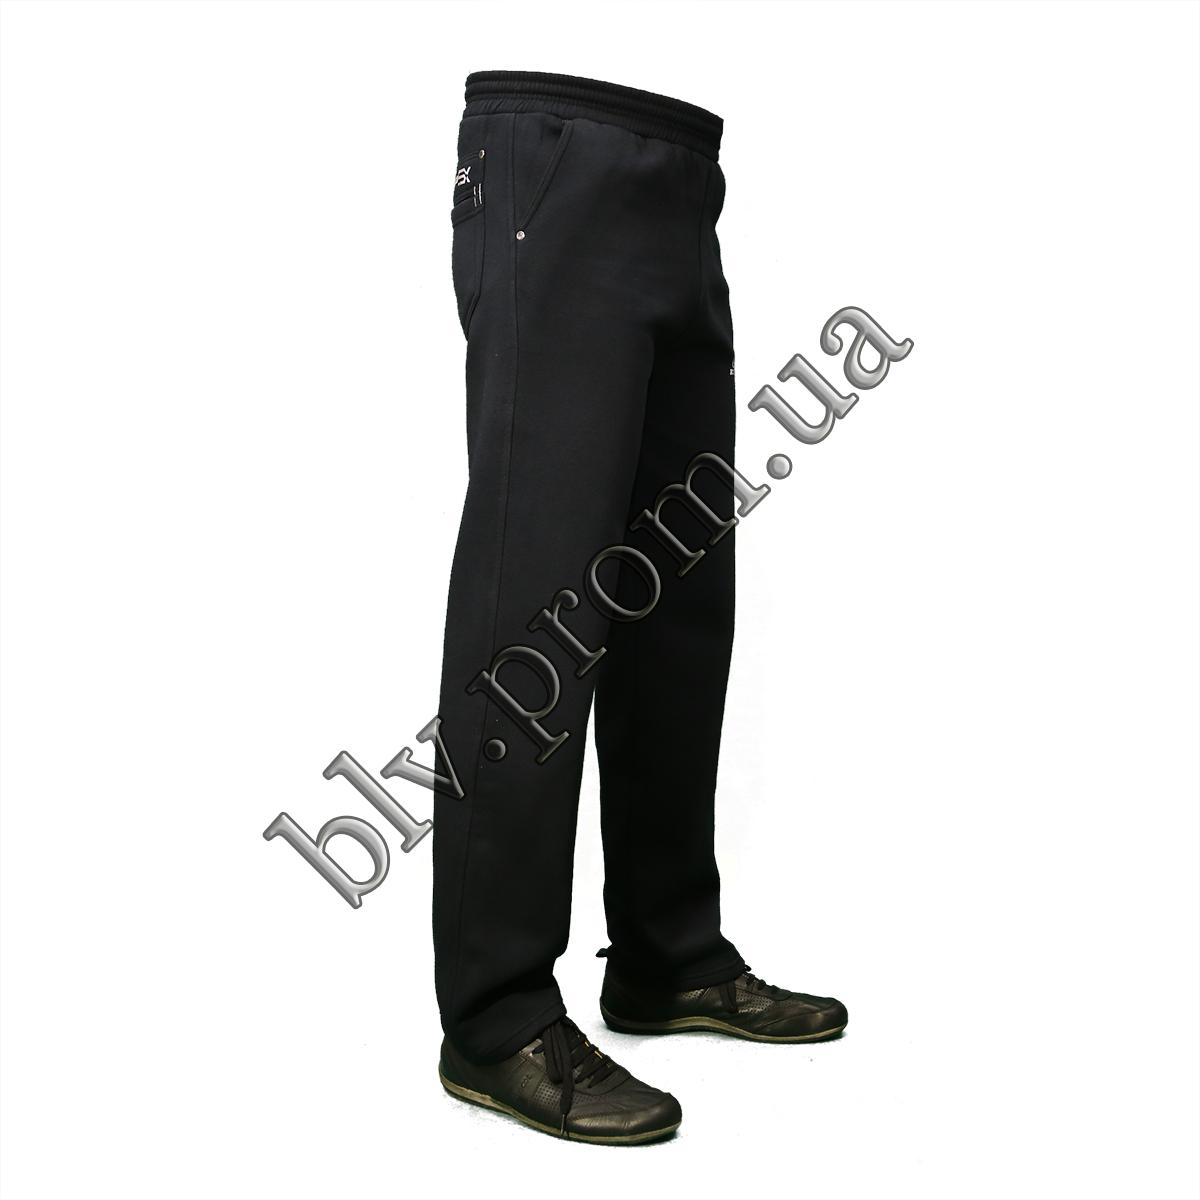 Теплые мужские брюки байка пр-во Турция KD759 Dark blue